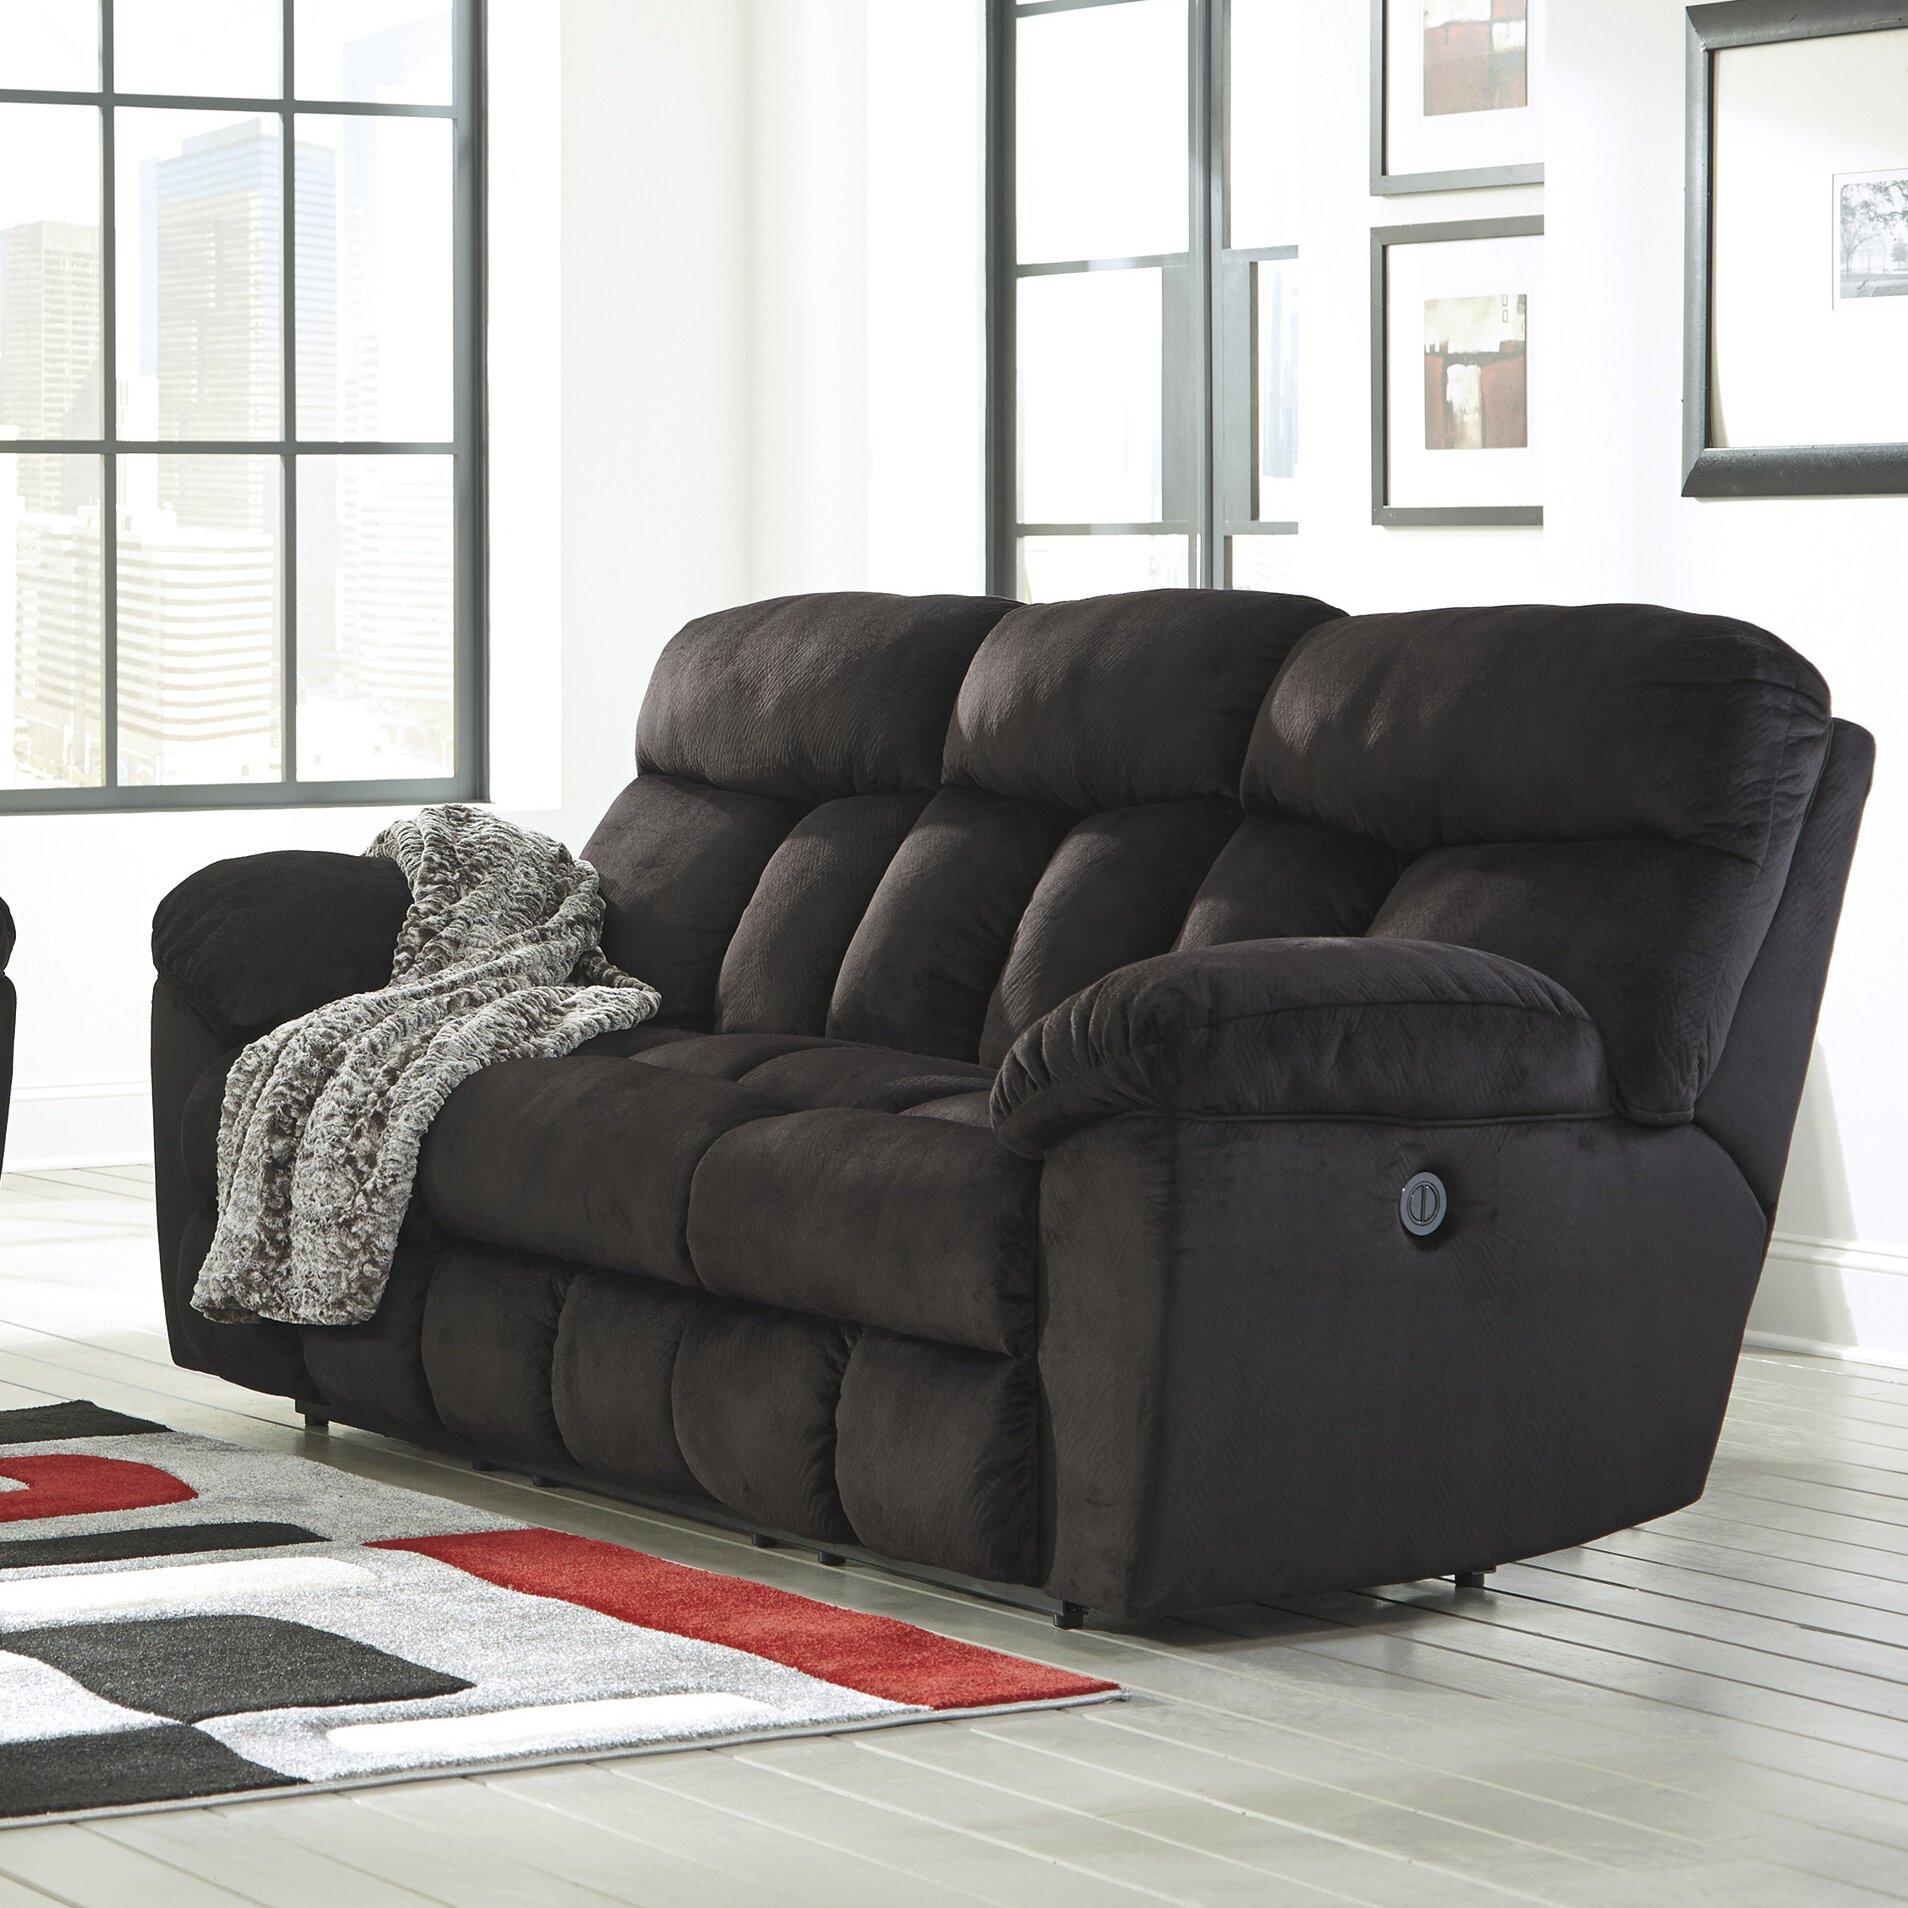 Signature Design By Ashley Saul Reclining Sofa Reviews